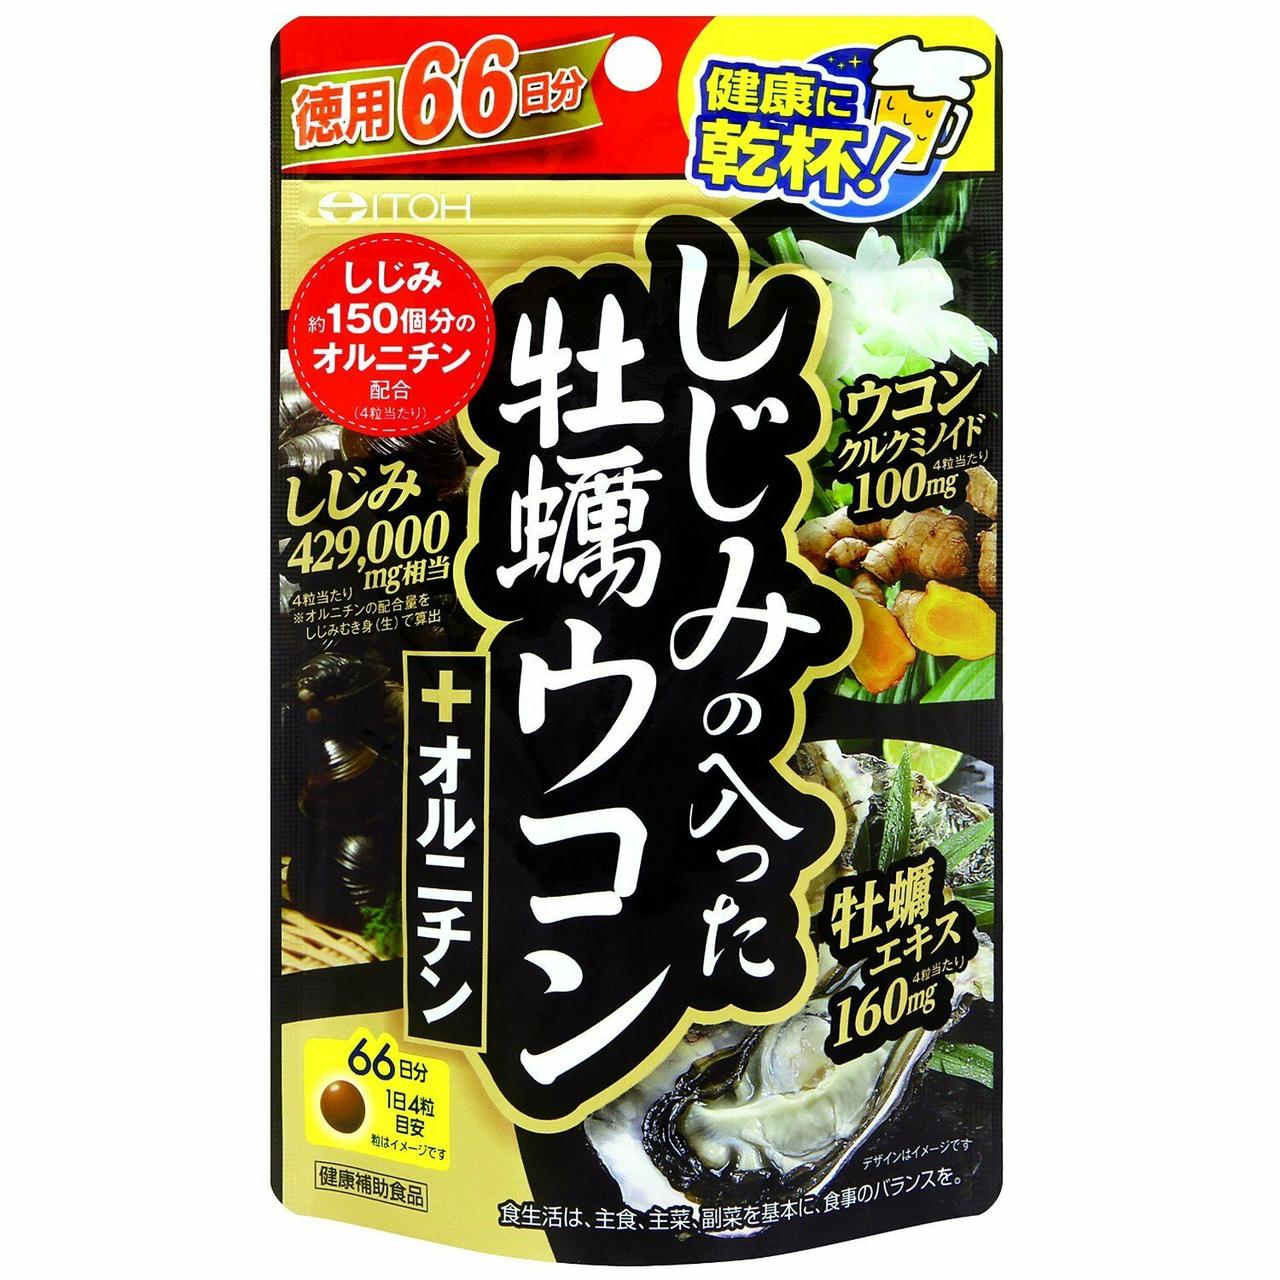 Японский ITOH  экстракт устриц  + экстракт моллюсков + куркума + орнитин  264 табл